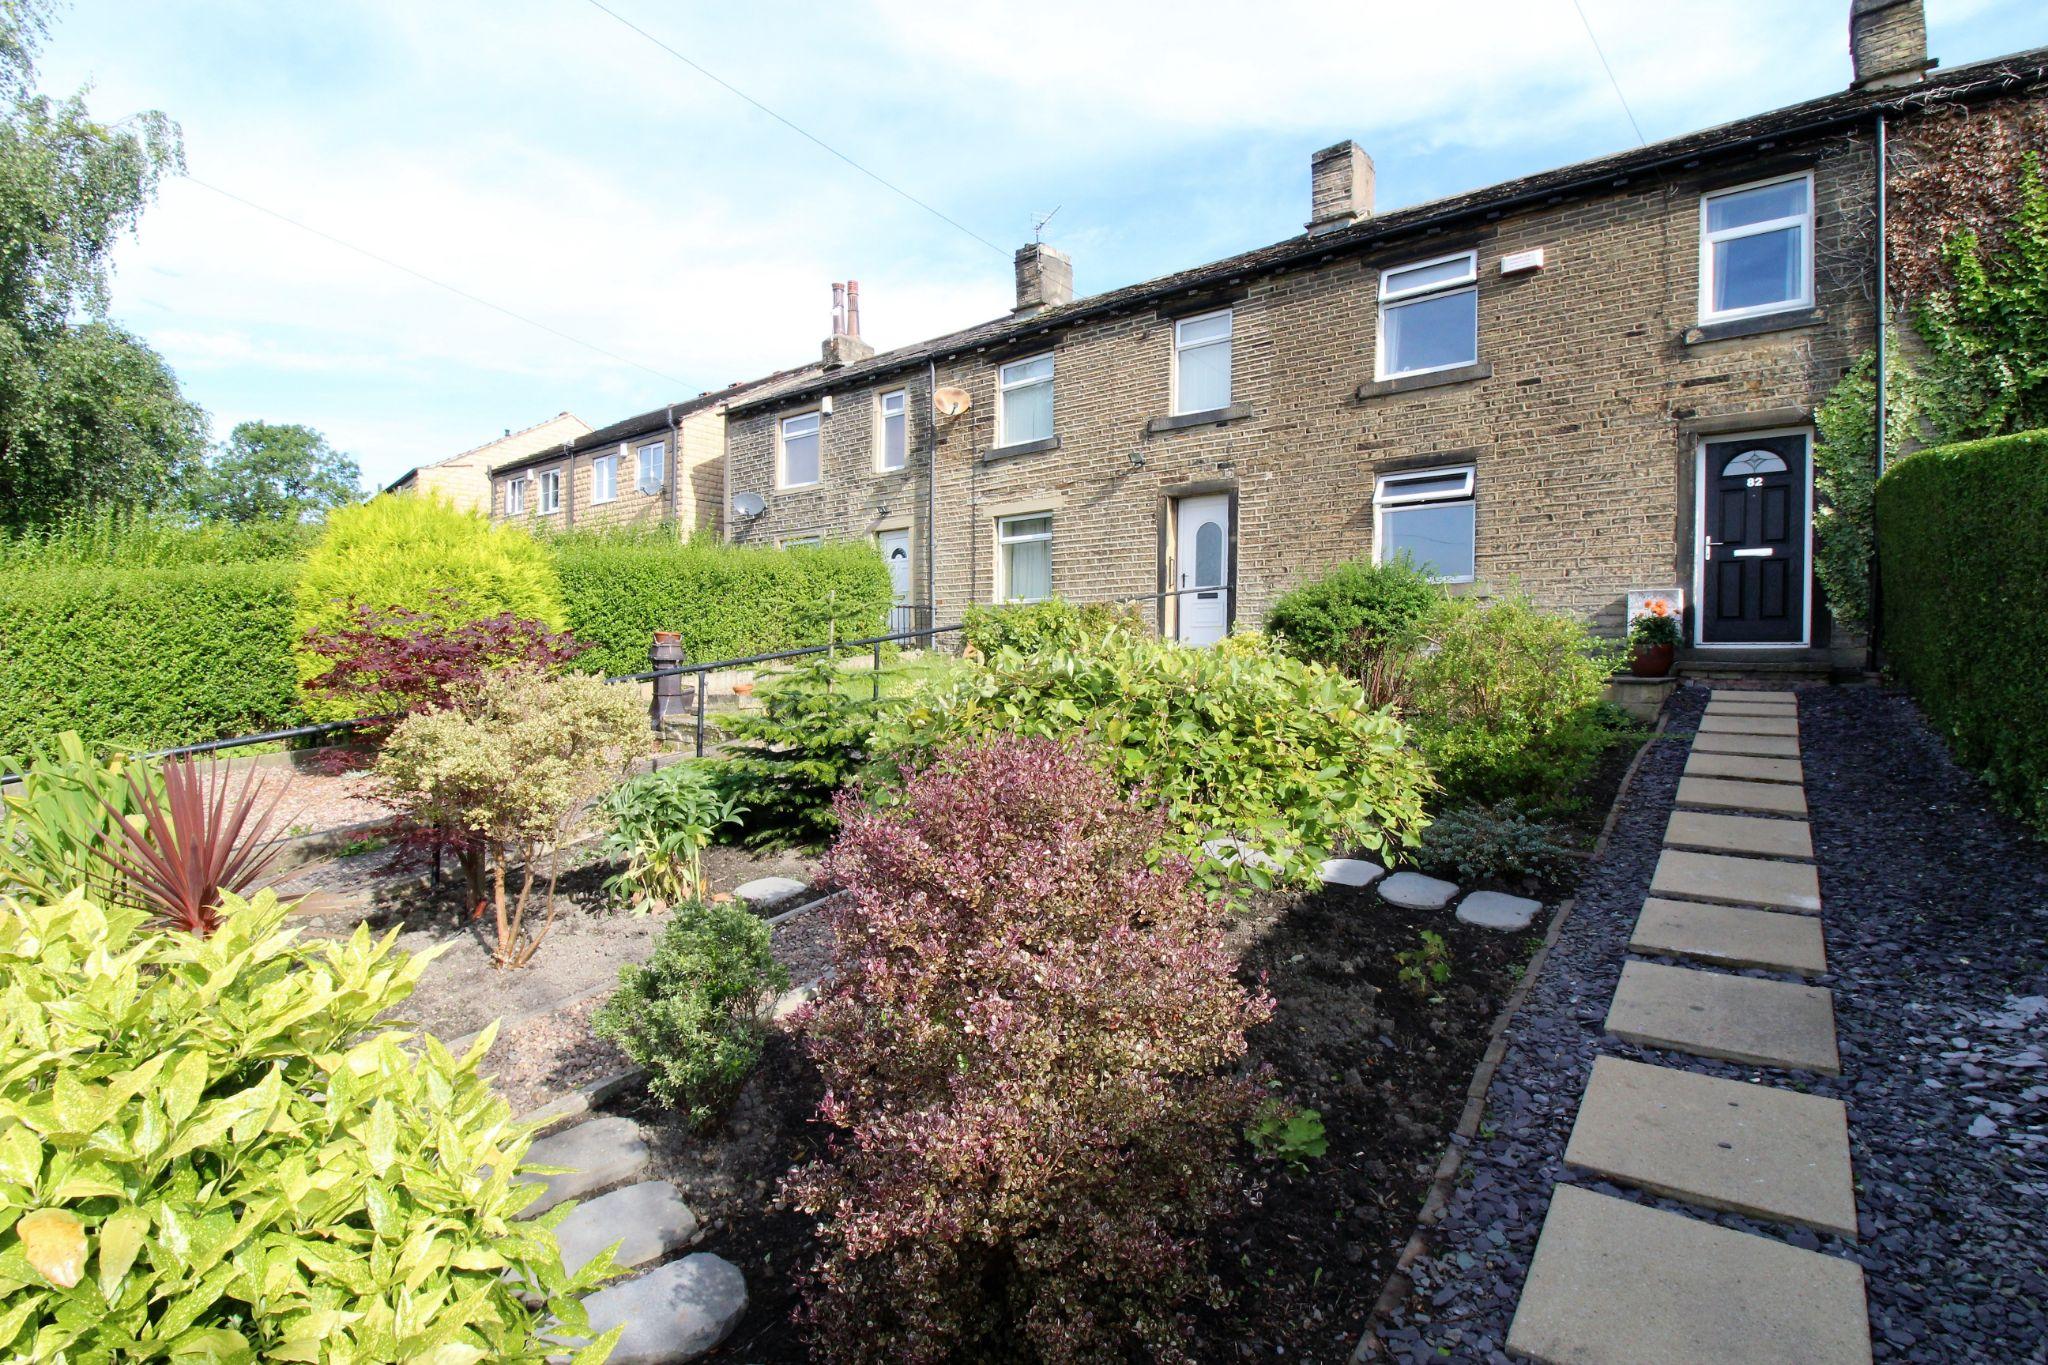 2 bedroom cottage house SSTC in Huddersfield - Front garden